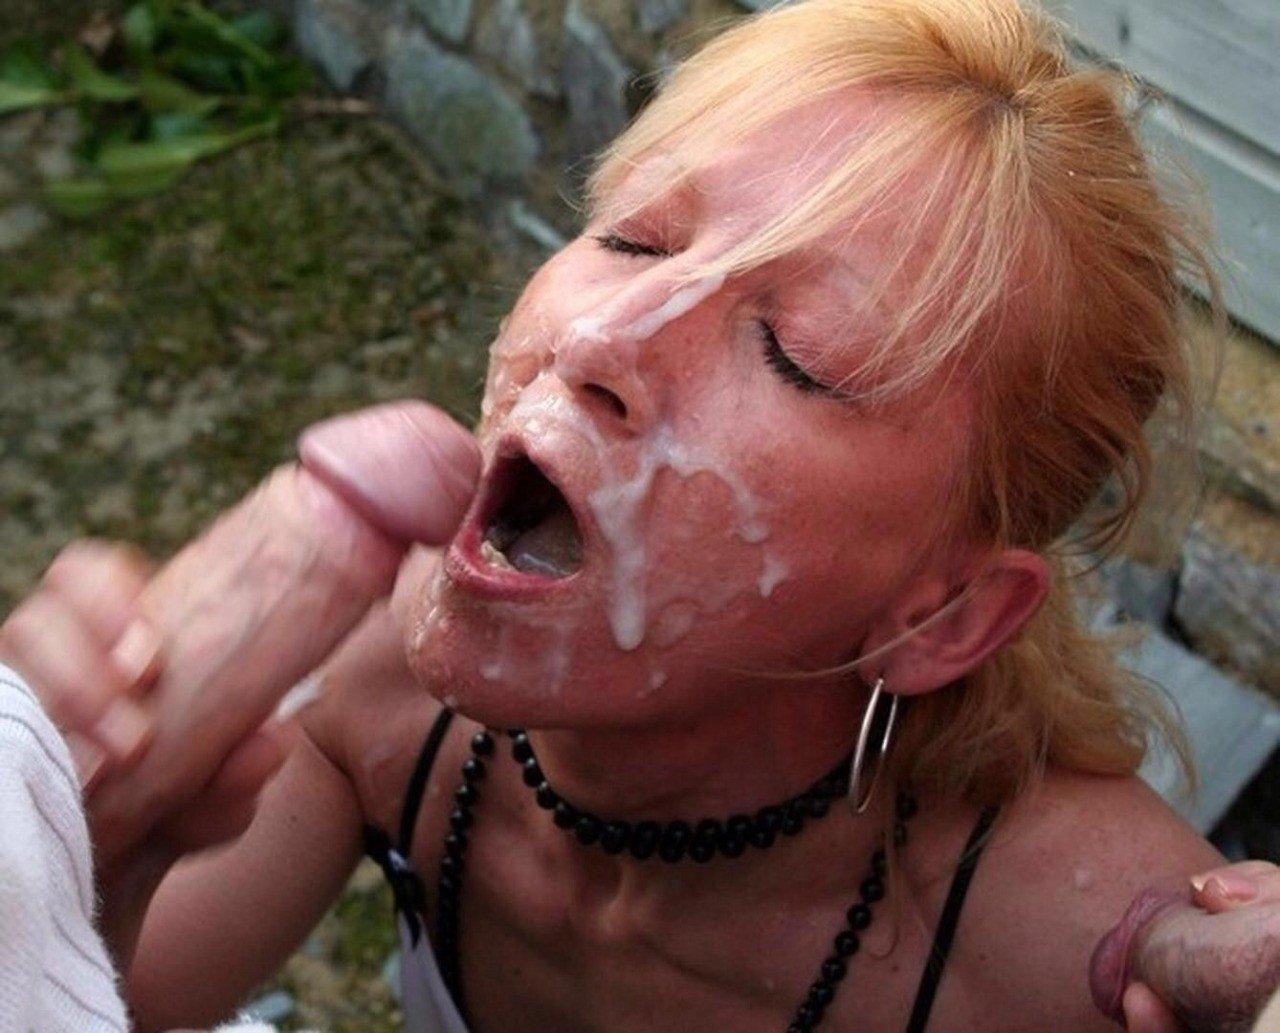 femme recouverte de sperme pute patong